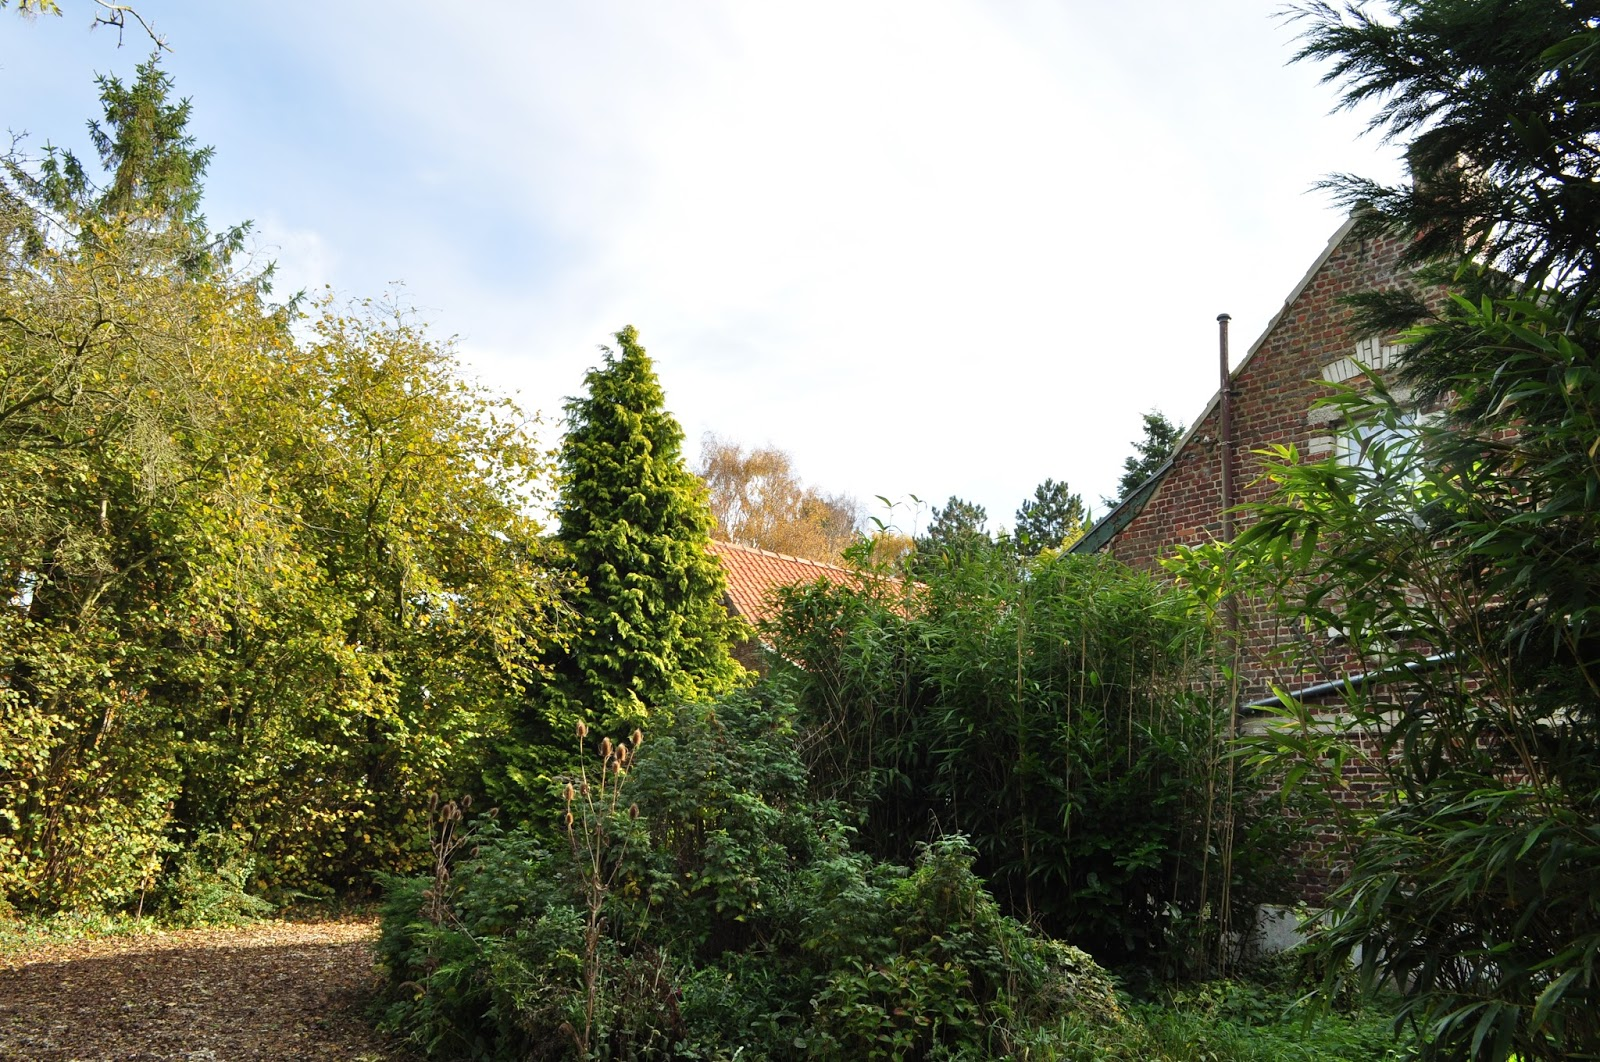 Jardin de la sauvagine 2017 octobre 2015 for Jardin octobre 2015